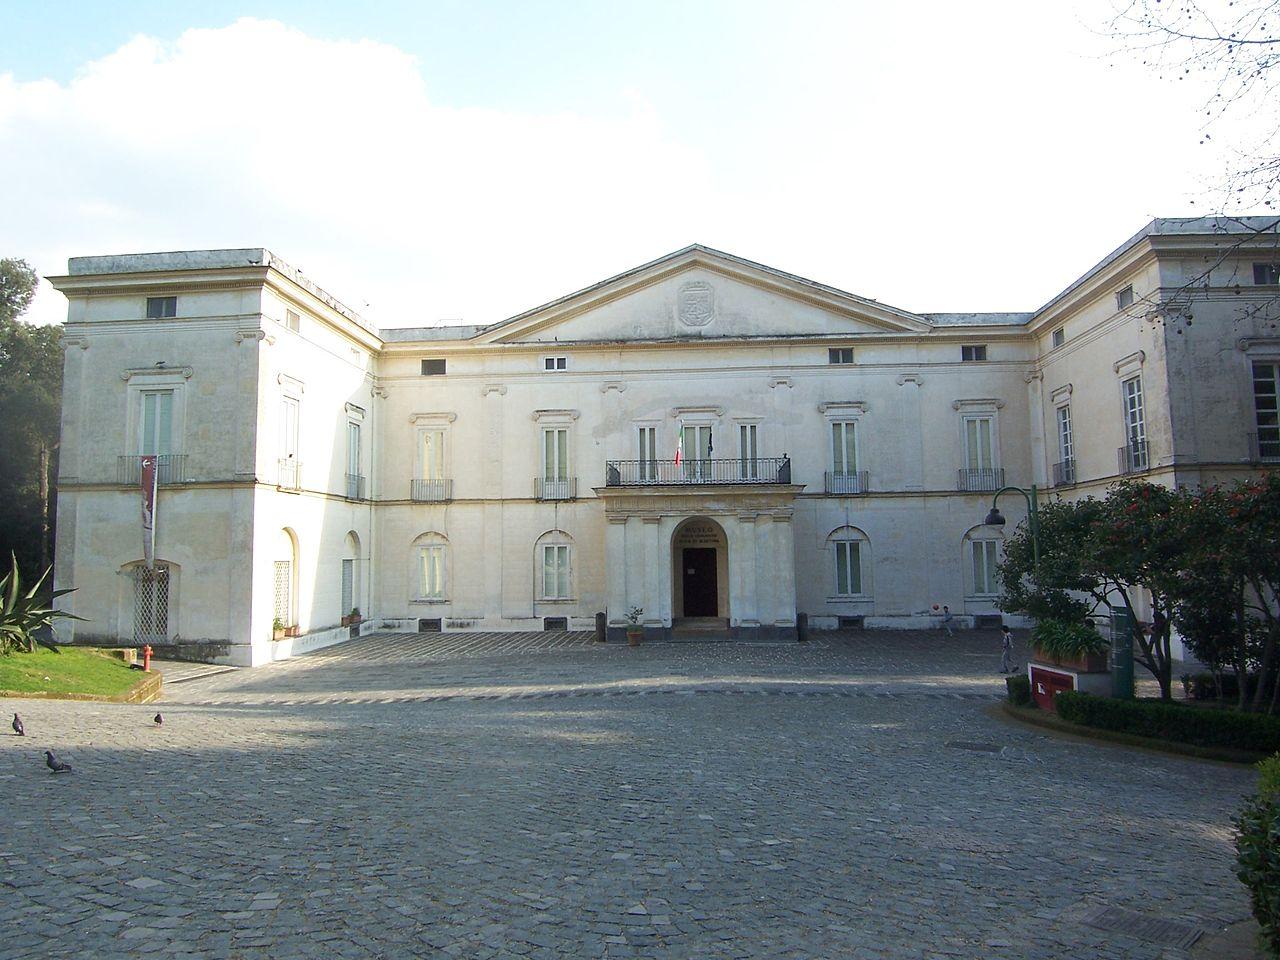 1280px-Villa_Floridiana,_Napoli_100_5956